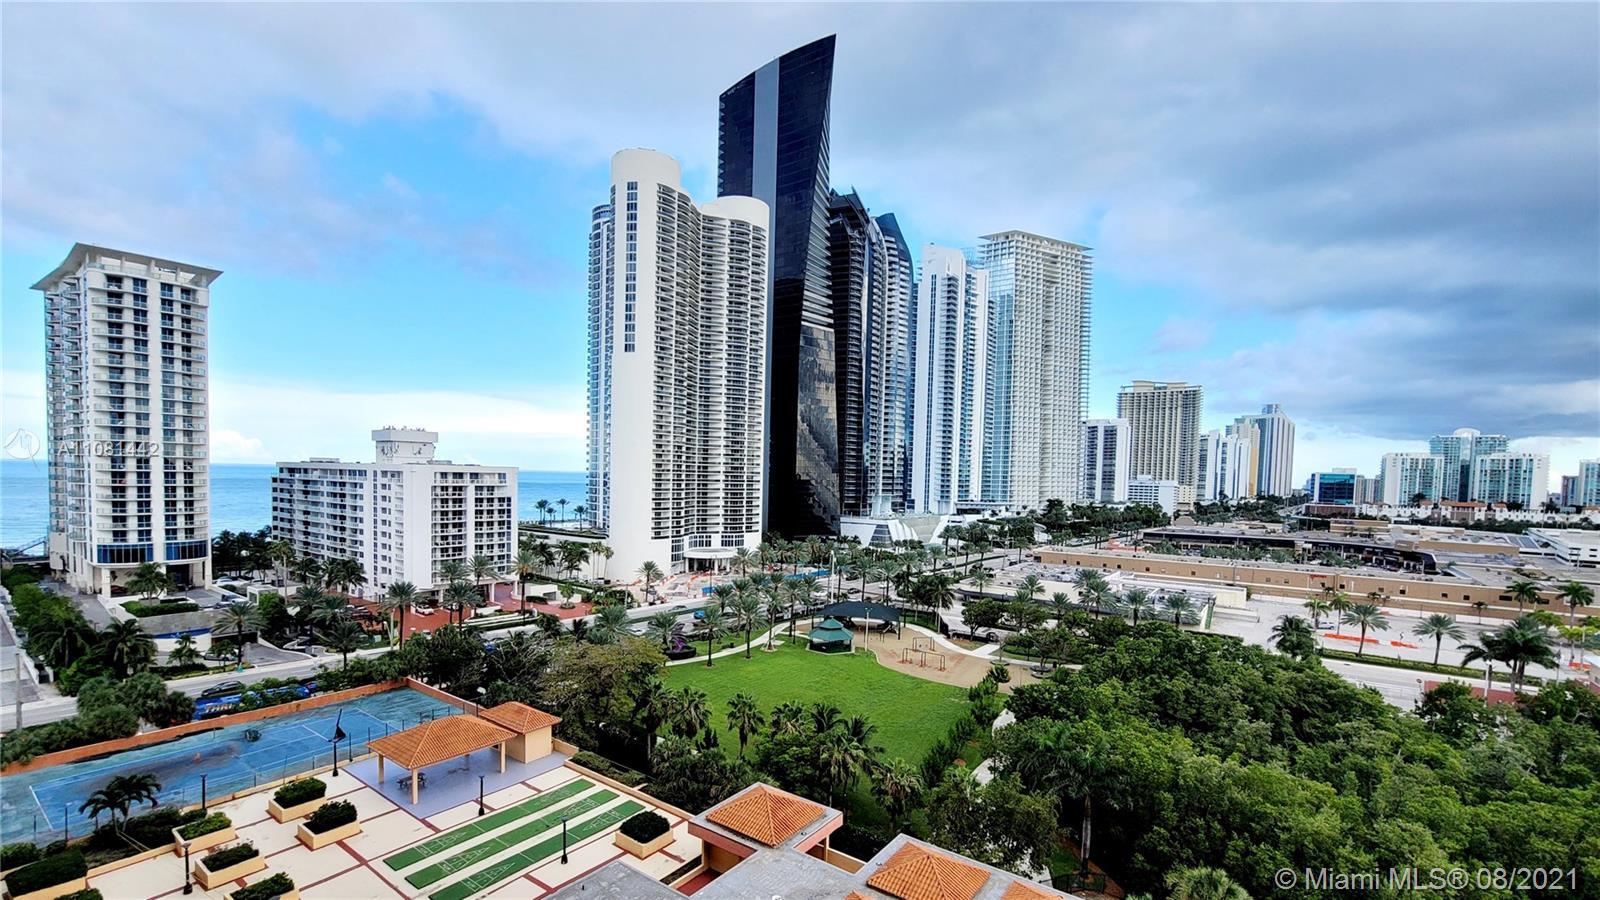 Winston Tower 600 #1405 - 210 174th St #1405, Sunny Isles Beach, FL 33160